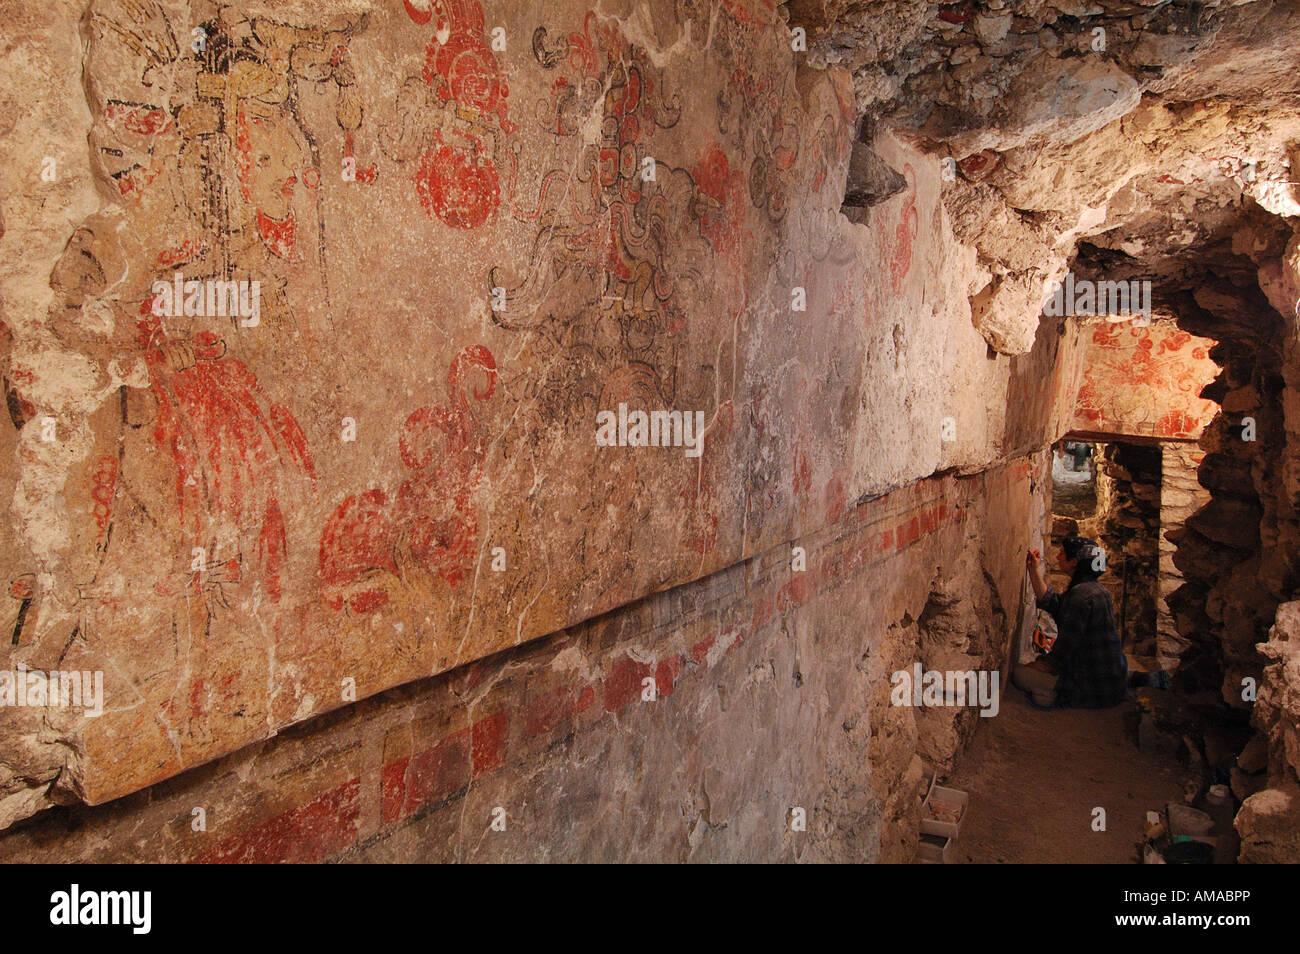 Maya, Maya Murals, San Bartolo, Guatemala, Dr. Bill Saturno - Stock Image